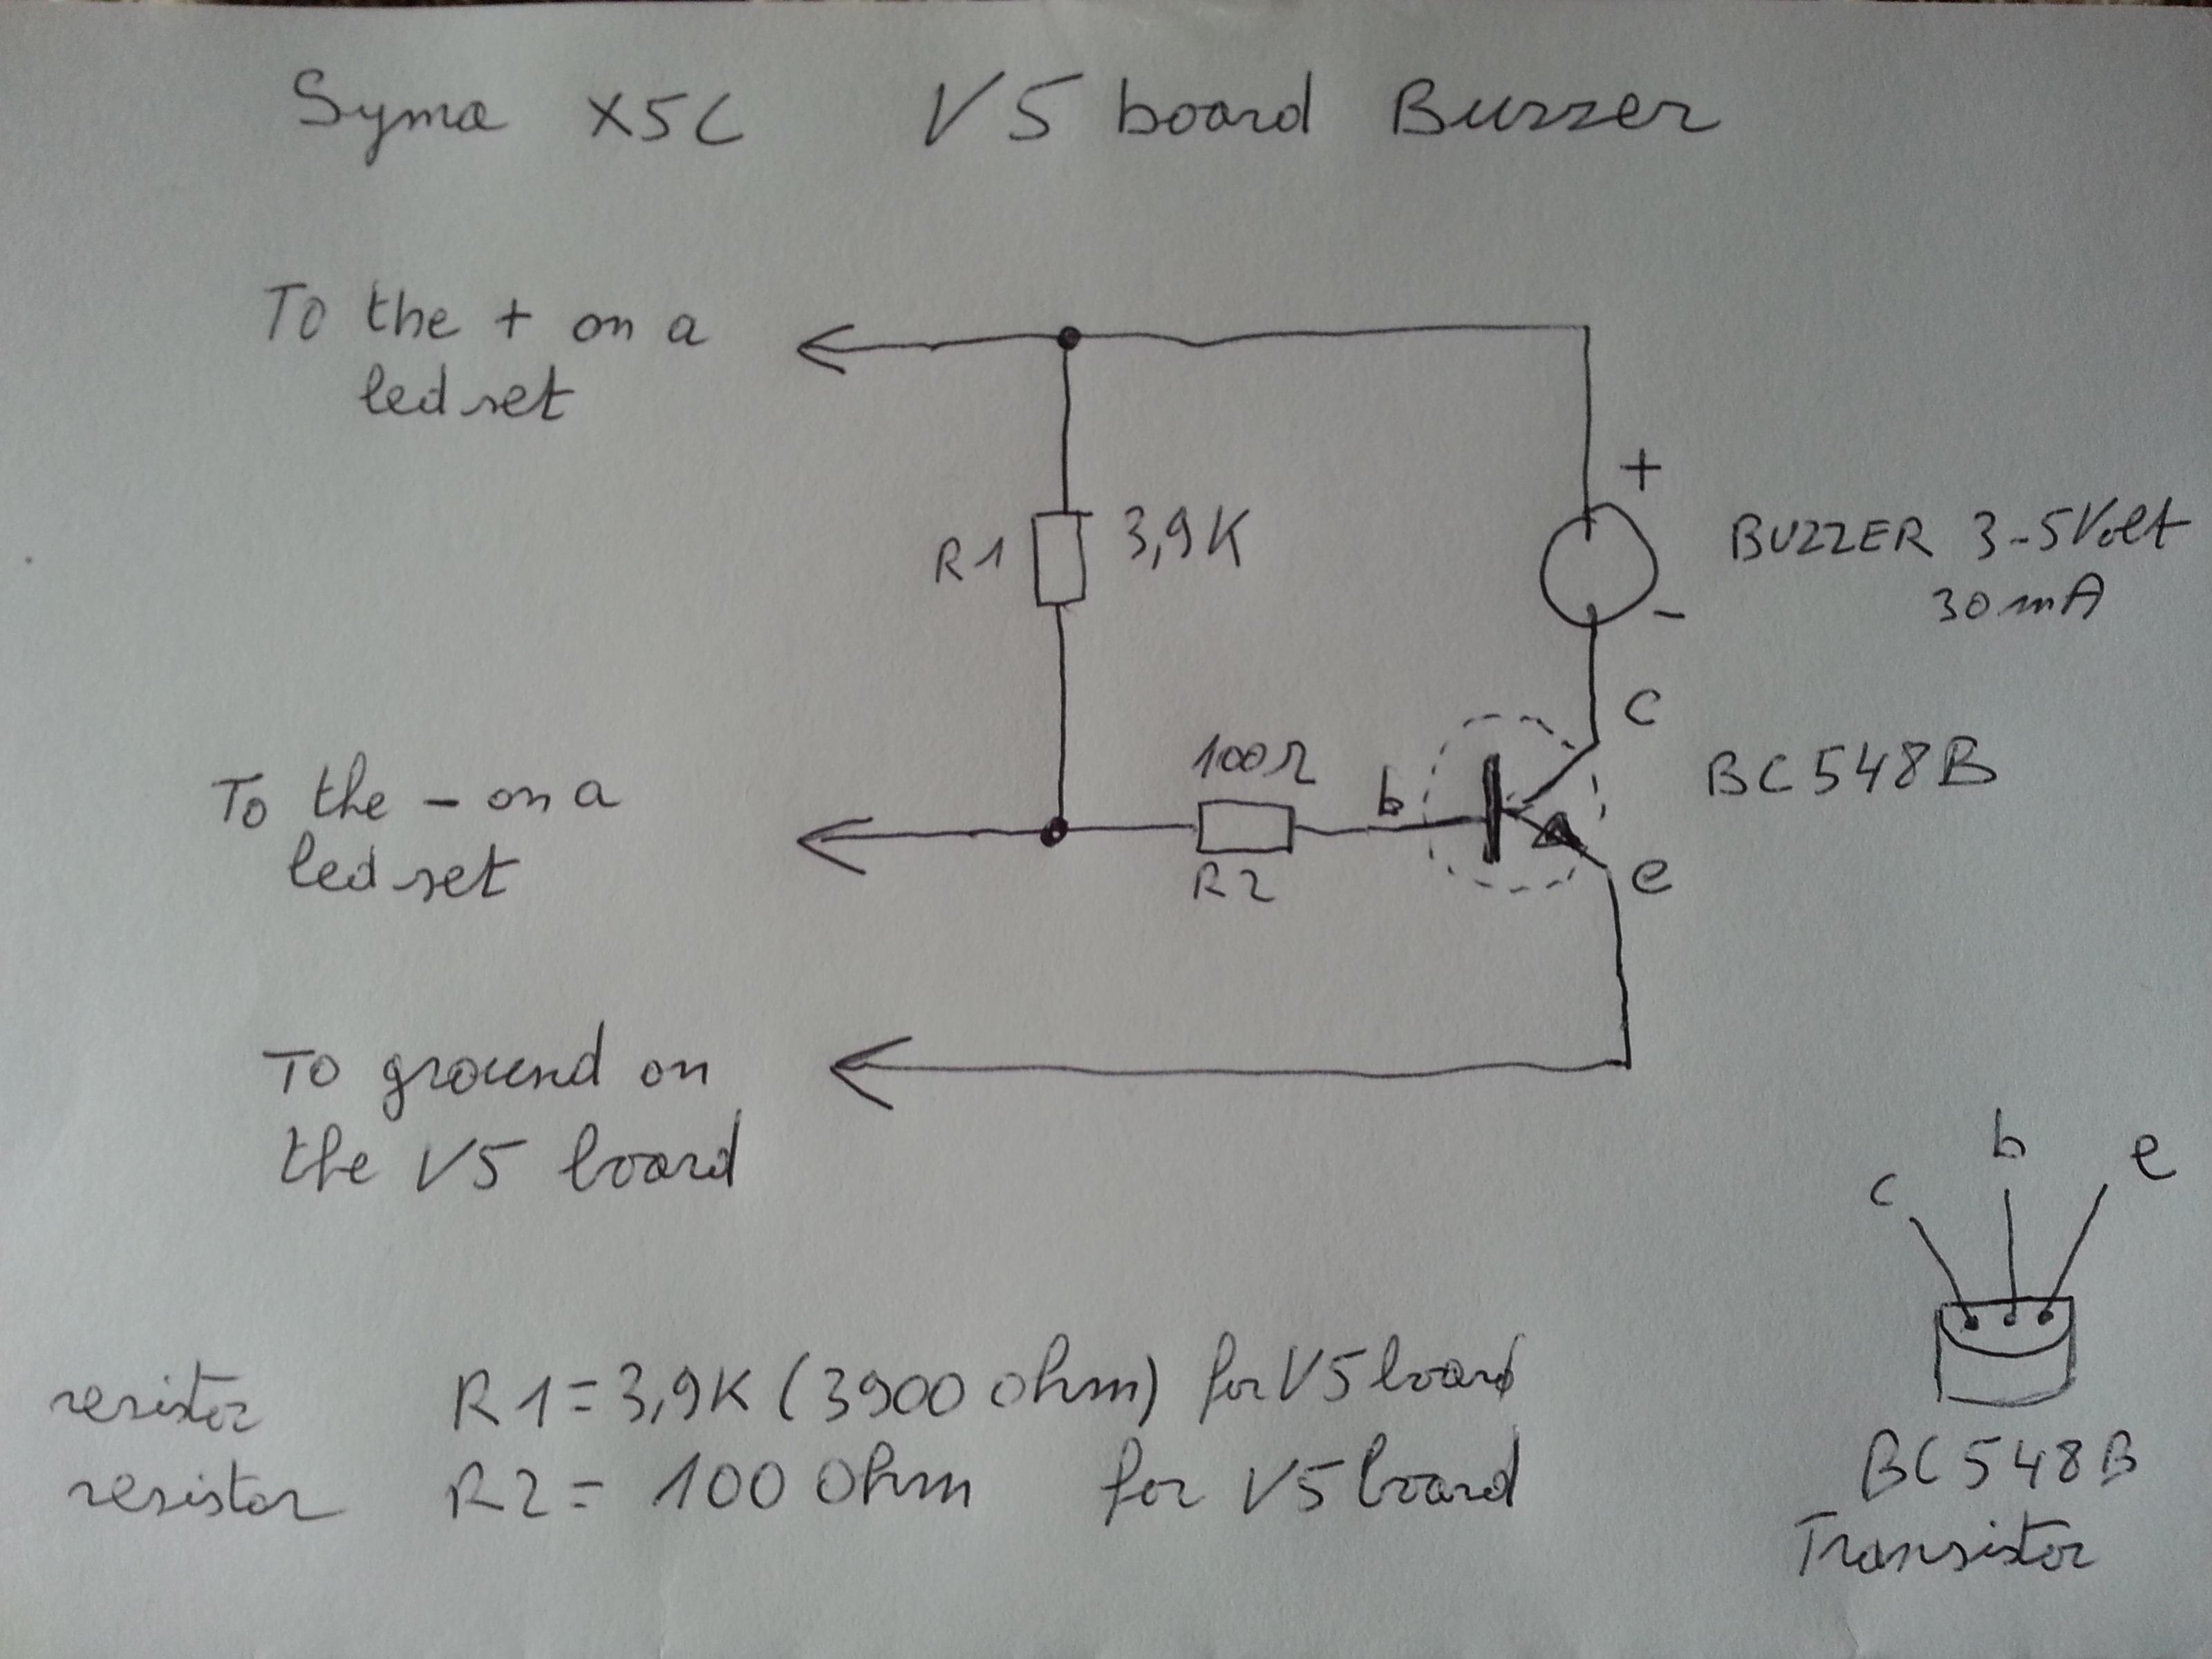 Attachment browser: Syma X5C buzzer schematic.jpg by Alias_Hendrik on